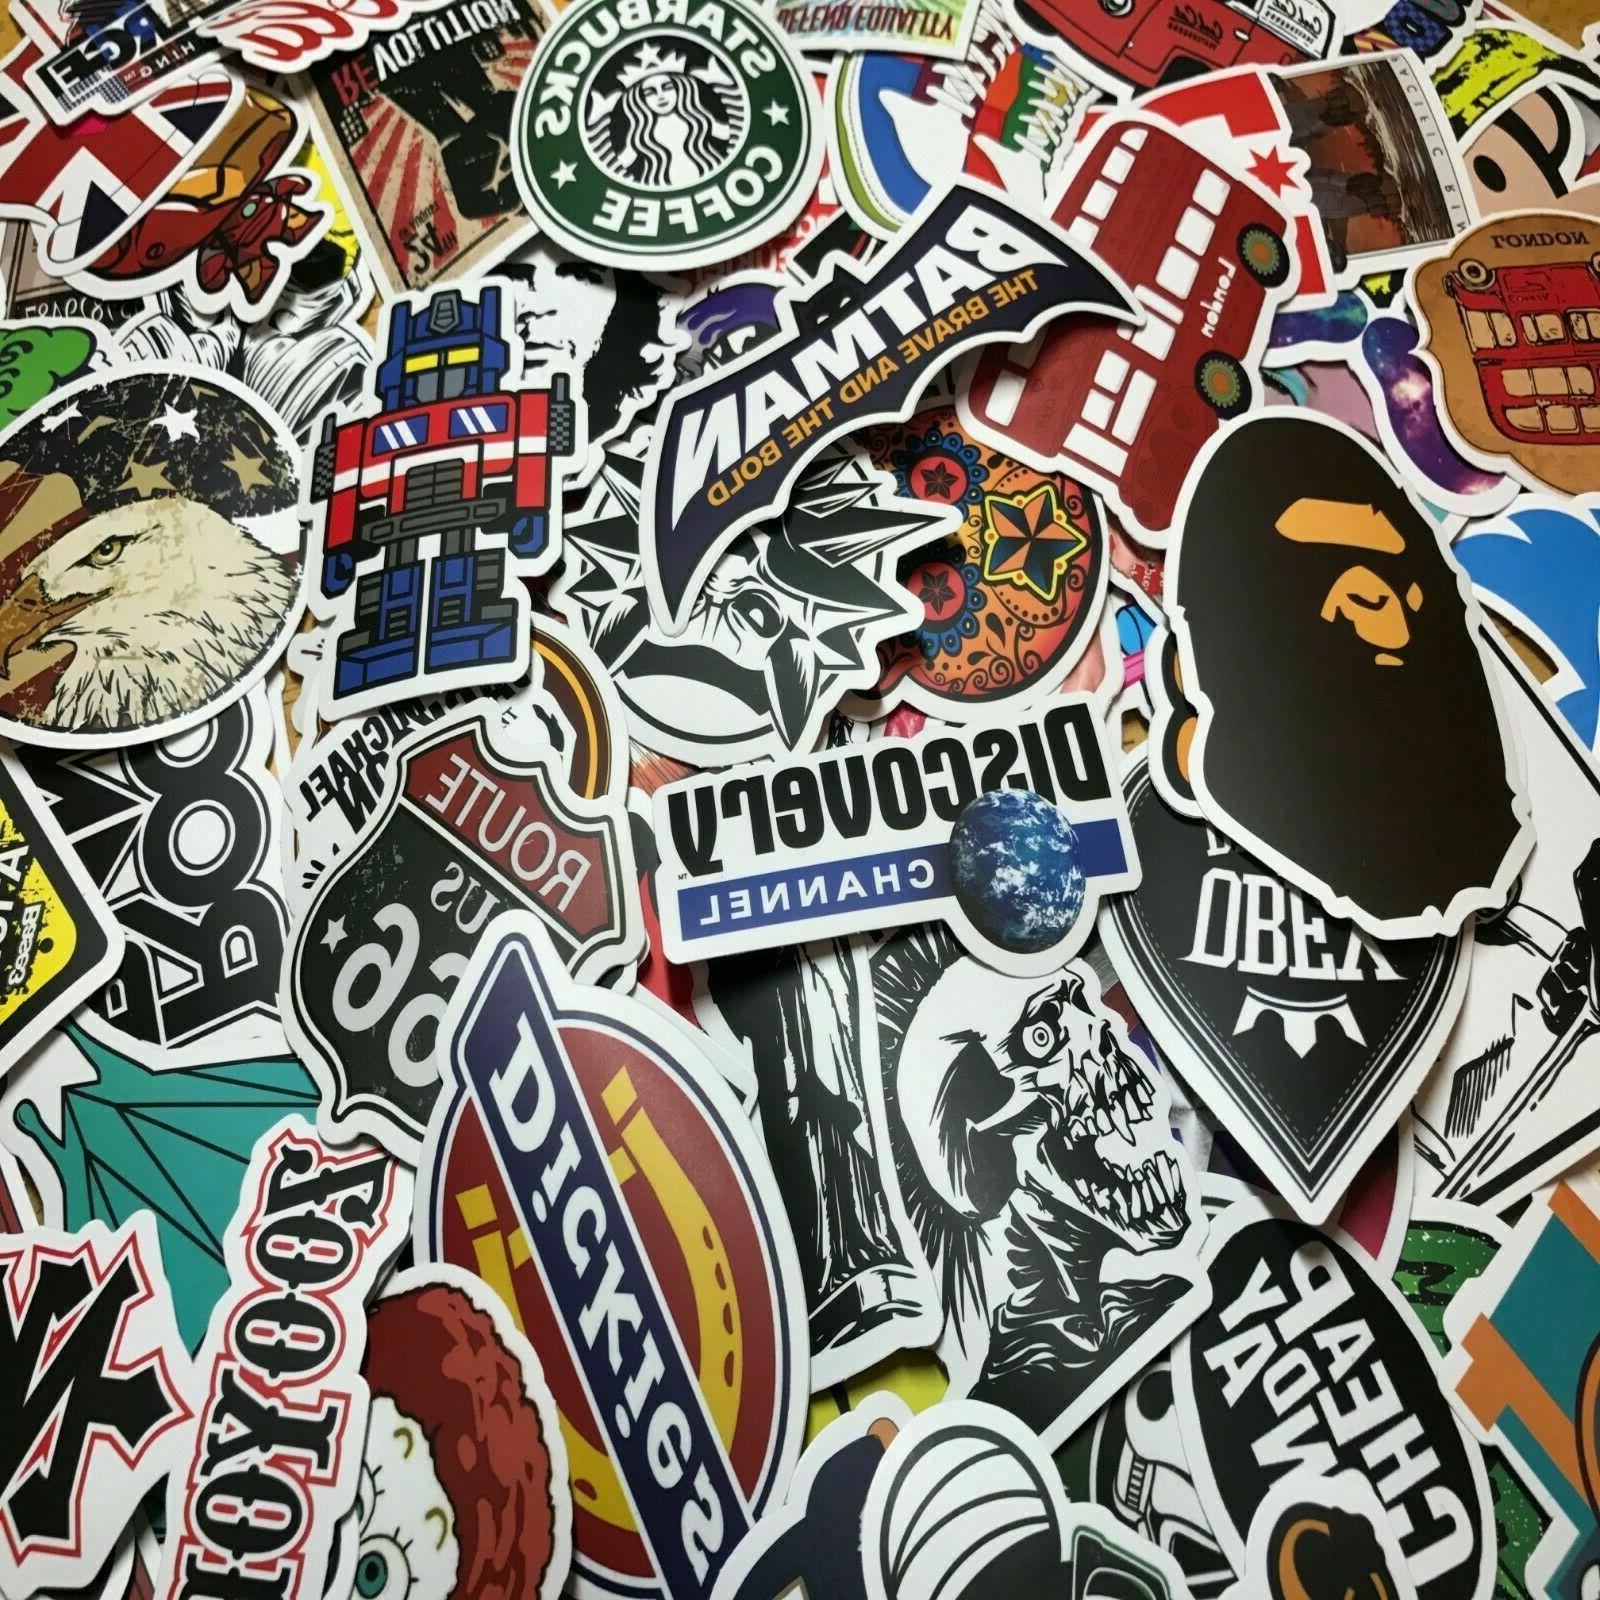 Vinyl Laptop Luggage Dope Sticker Lot